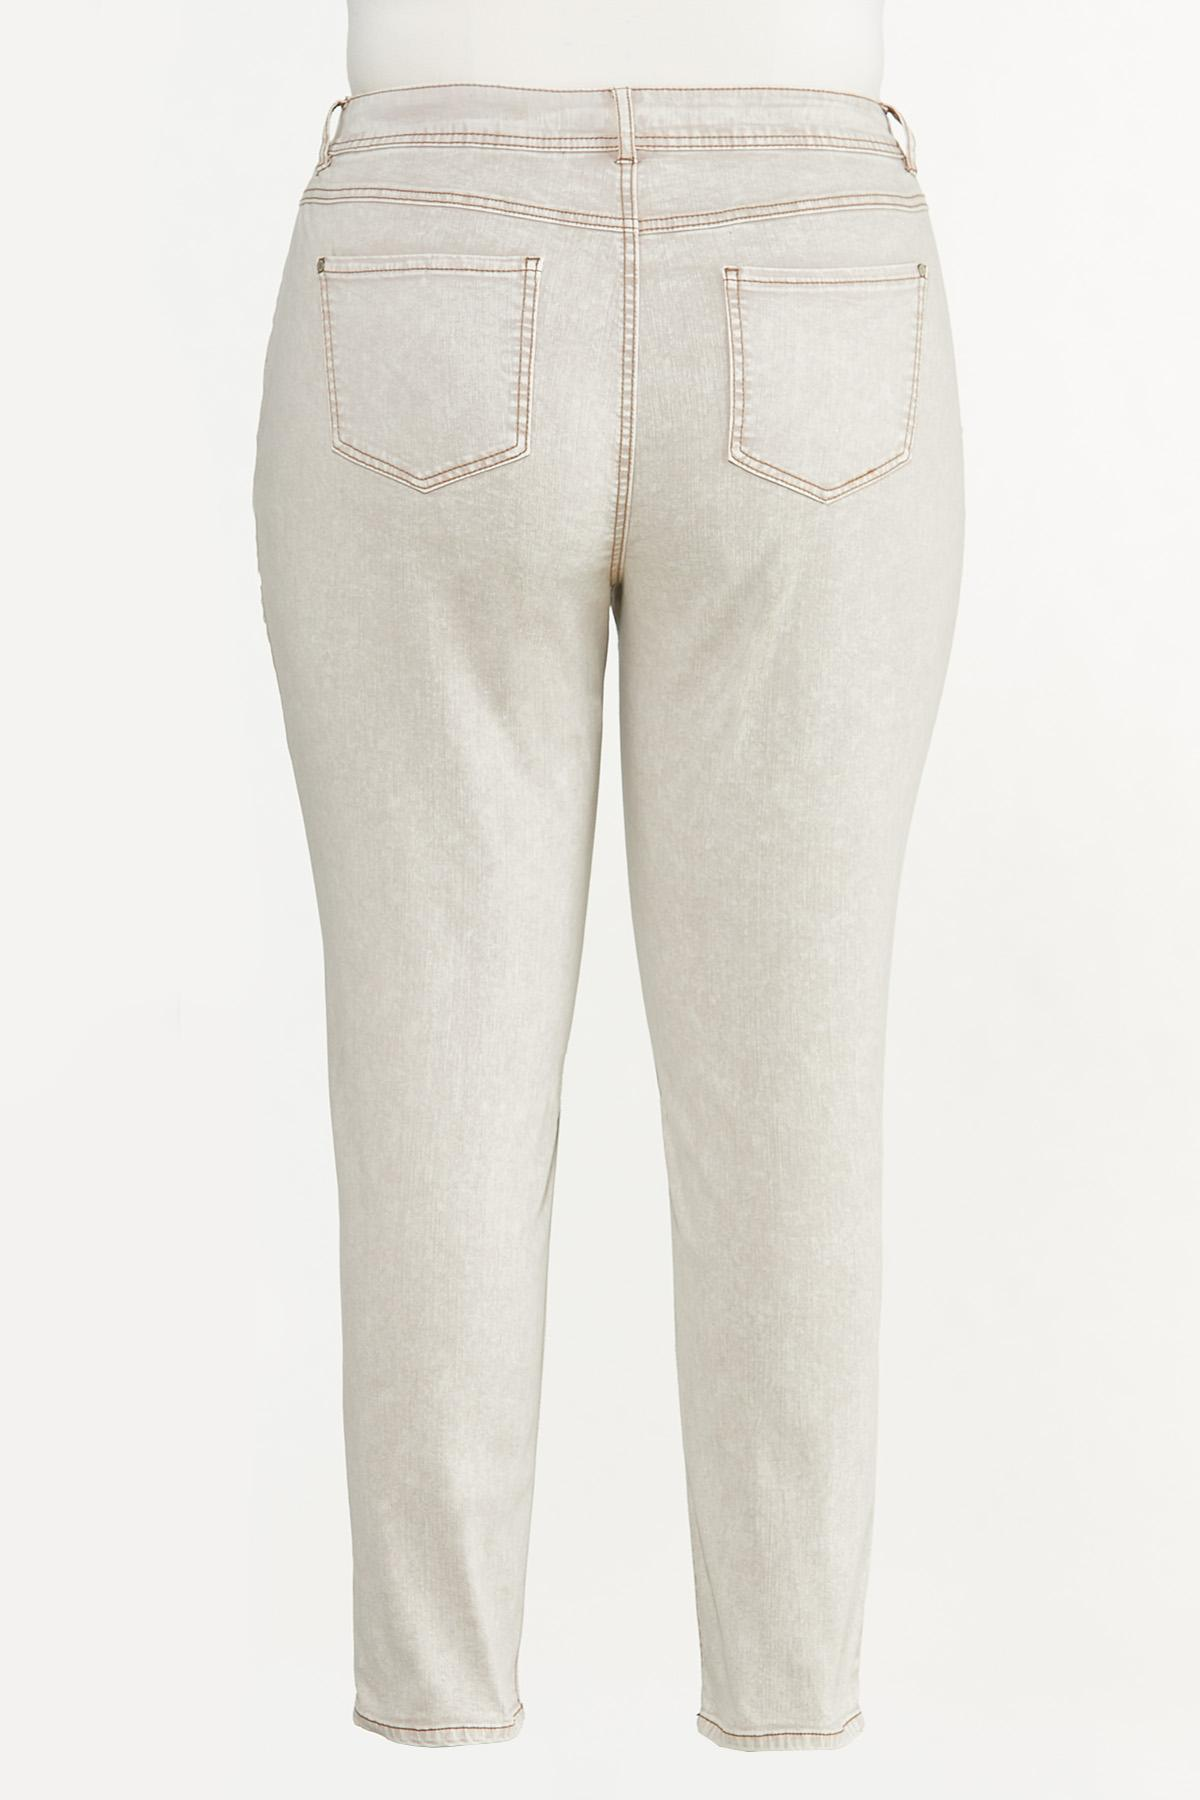 Plus Size Beige High-Rise Skinny Jeans (Item #44643775)